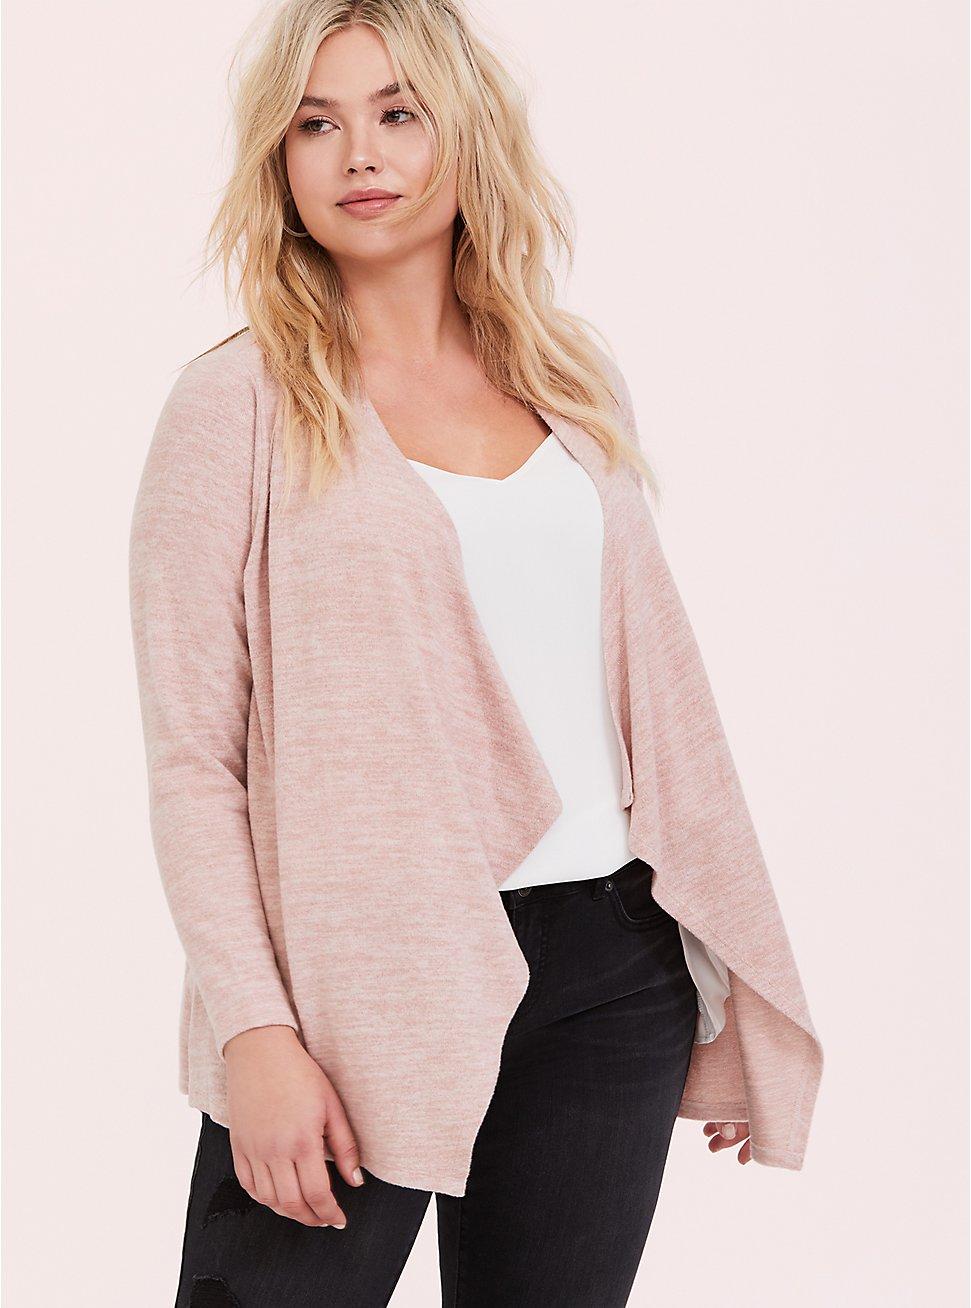 Plus Size Super Soft Plush Light Pink Drape Front Cardigan, PALE BLUSH, hi-res